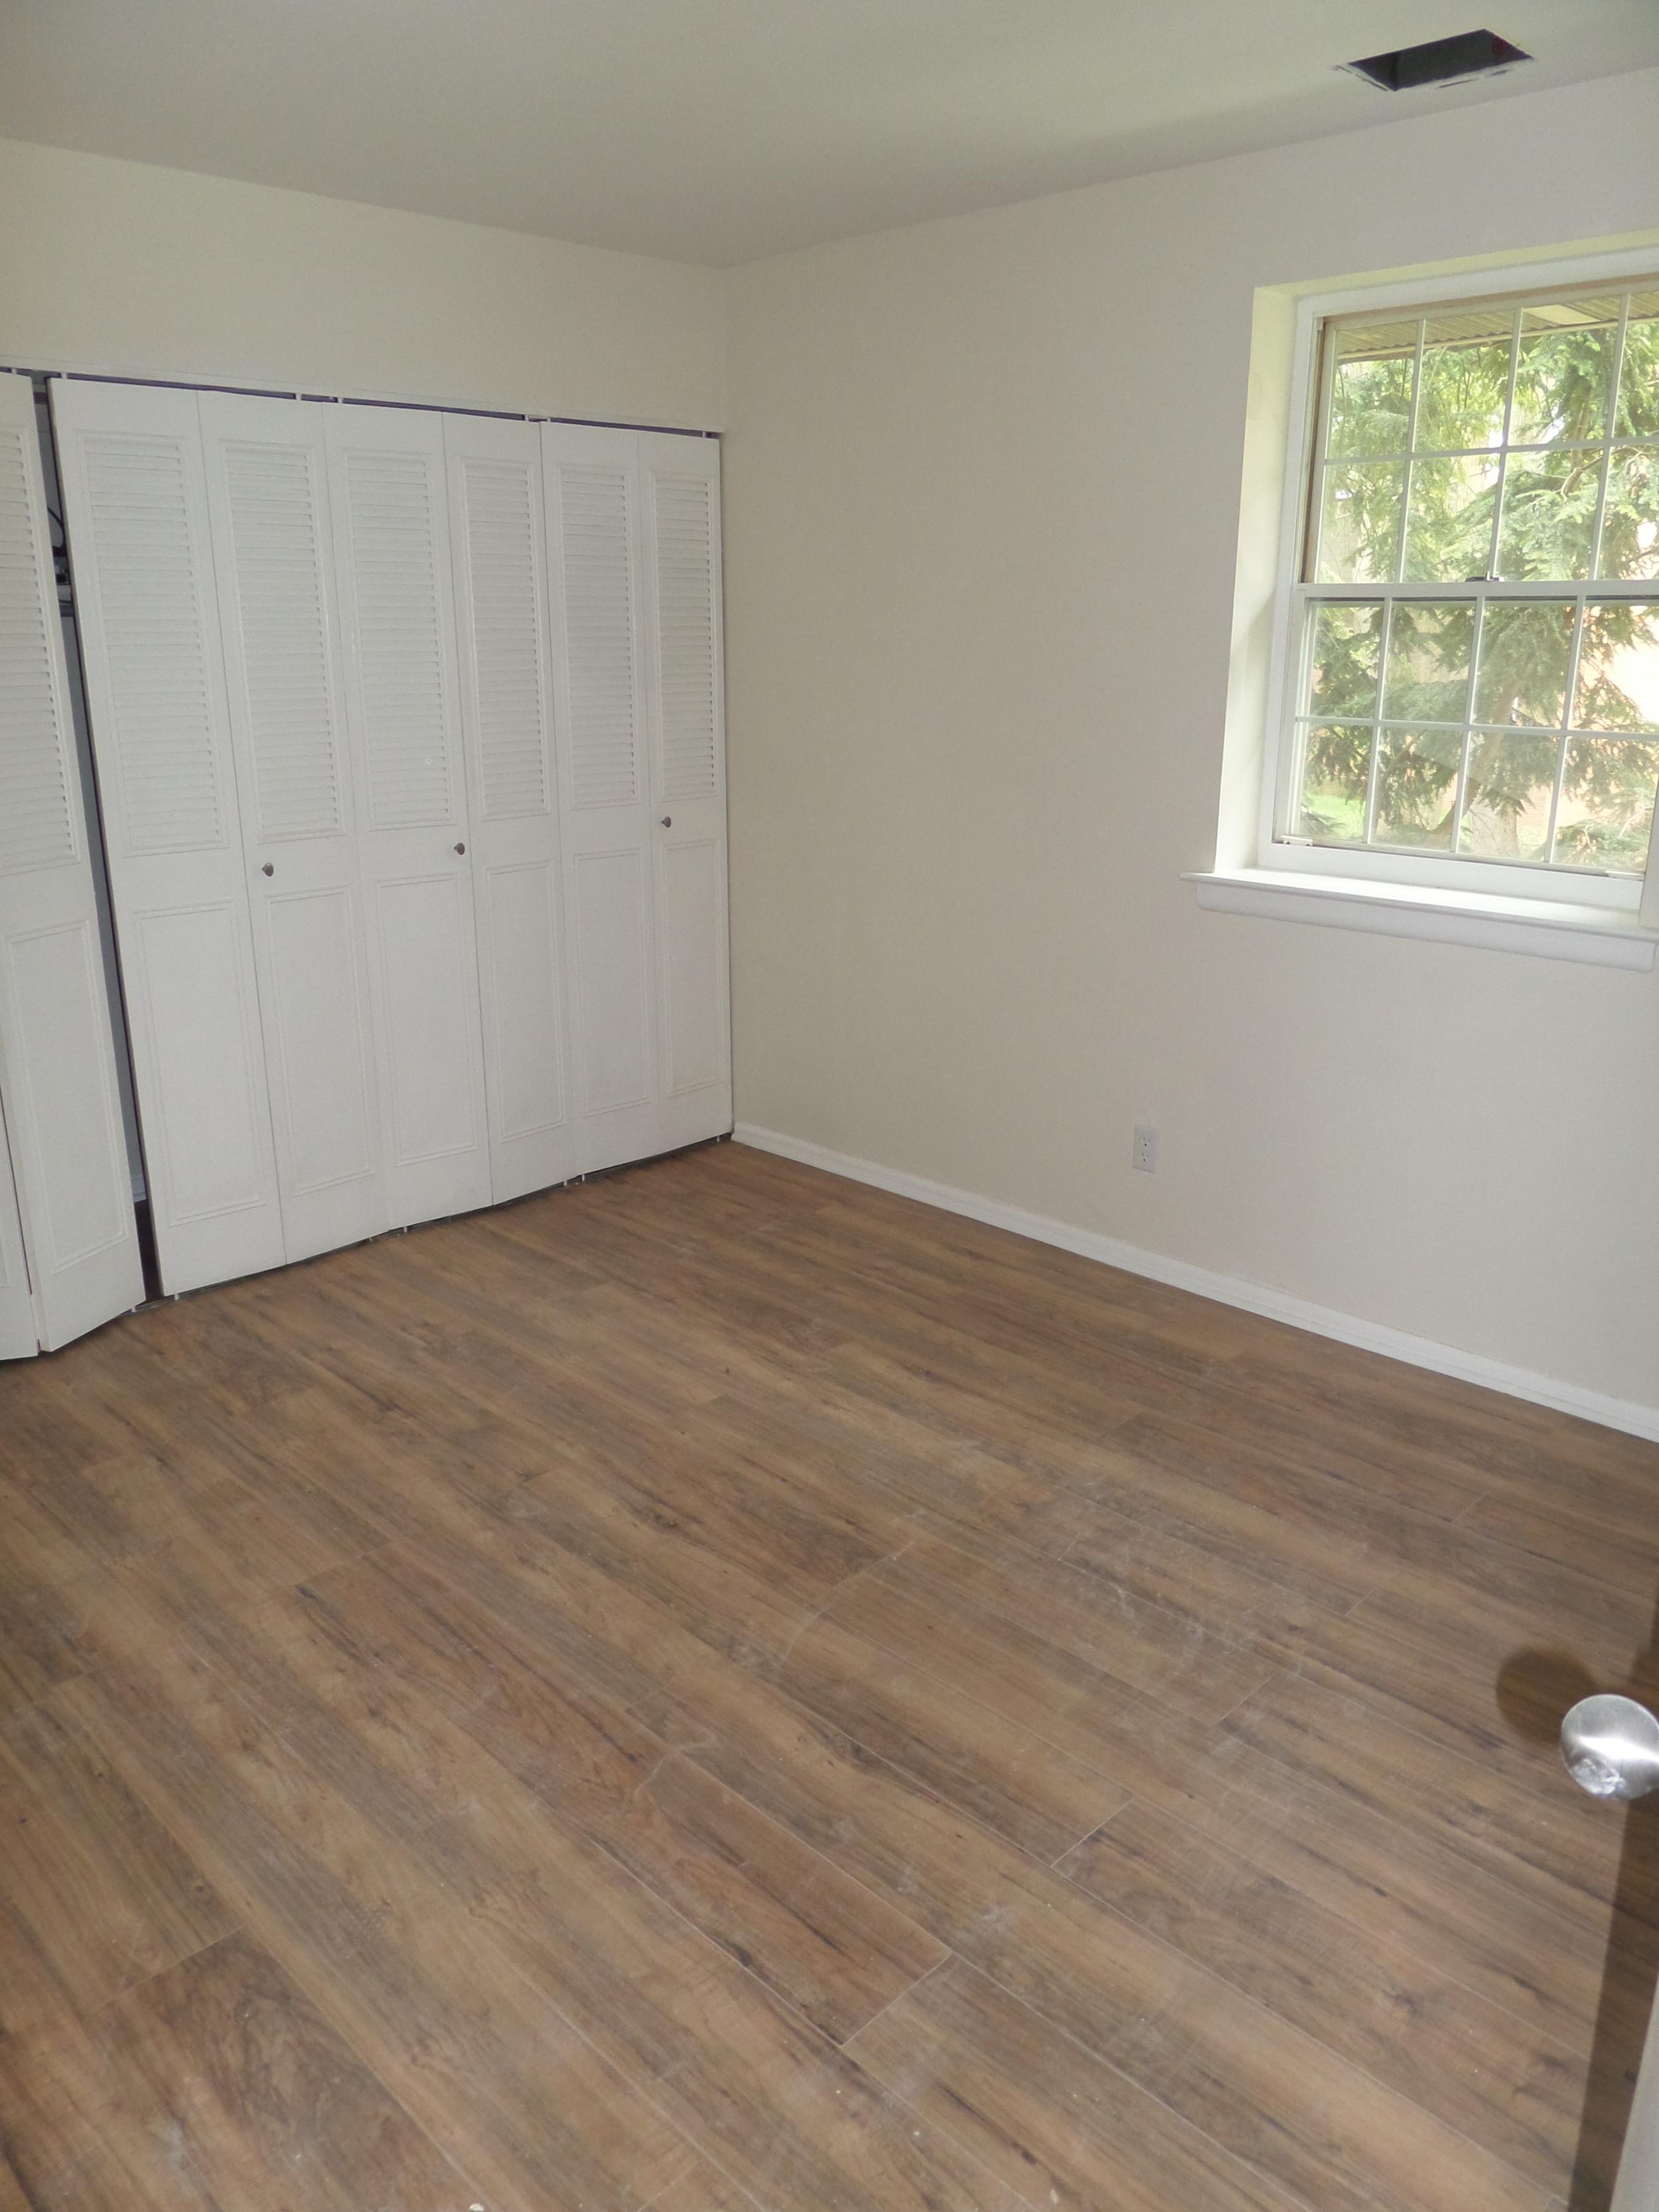 gypsy lane bedroom after.JPG